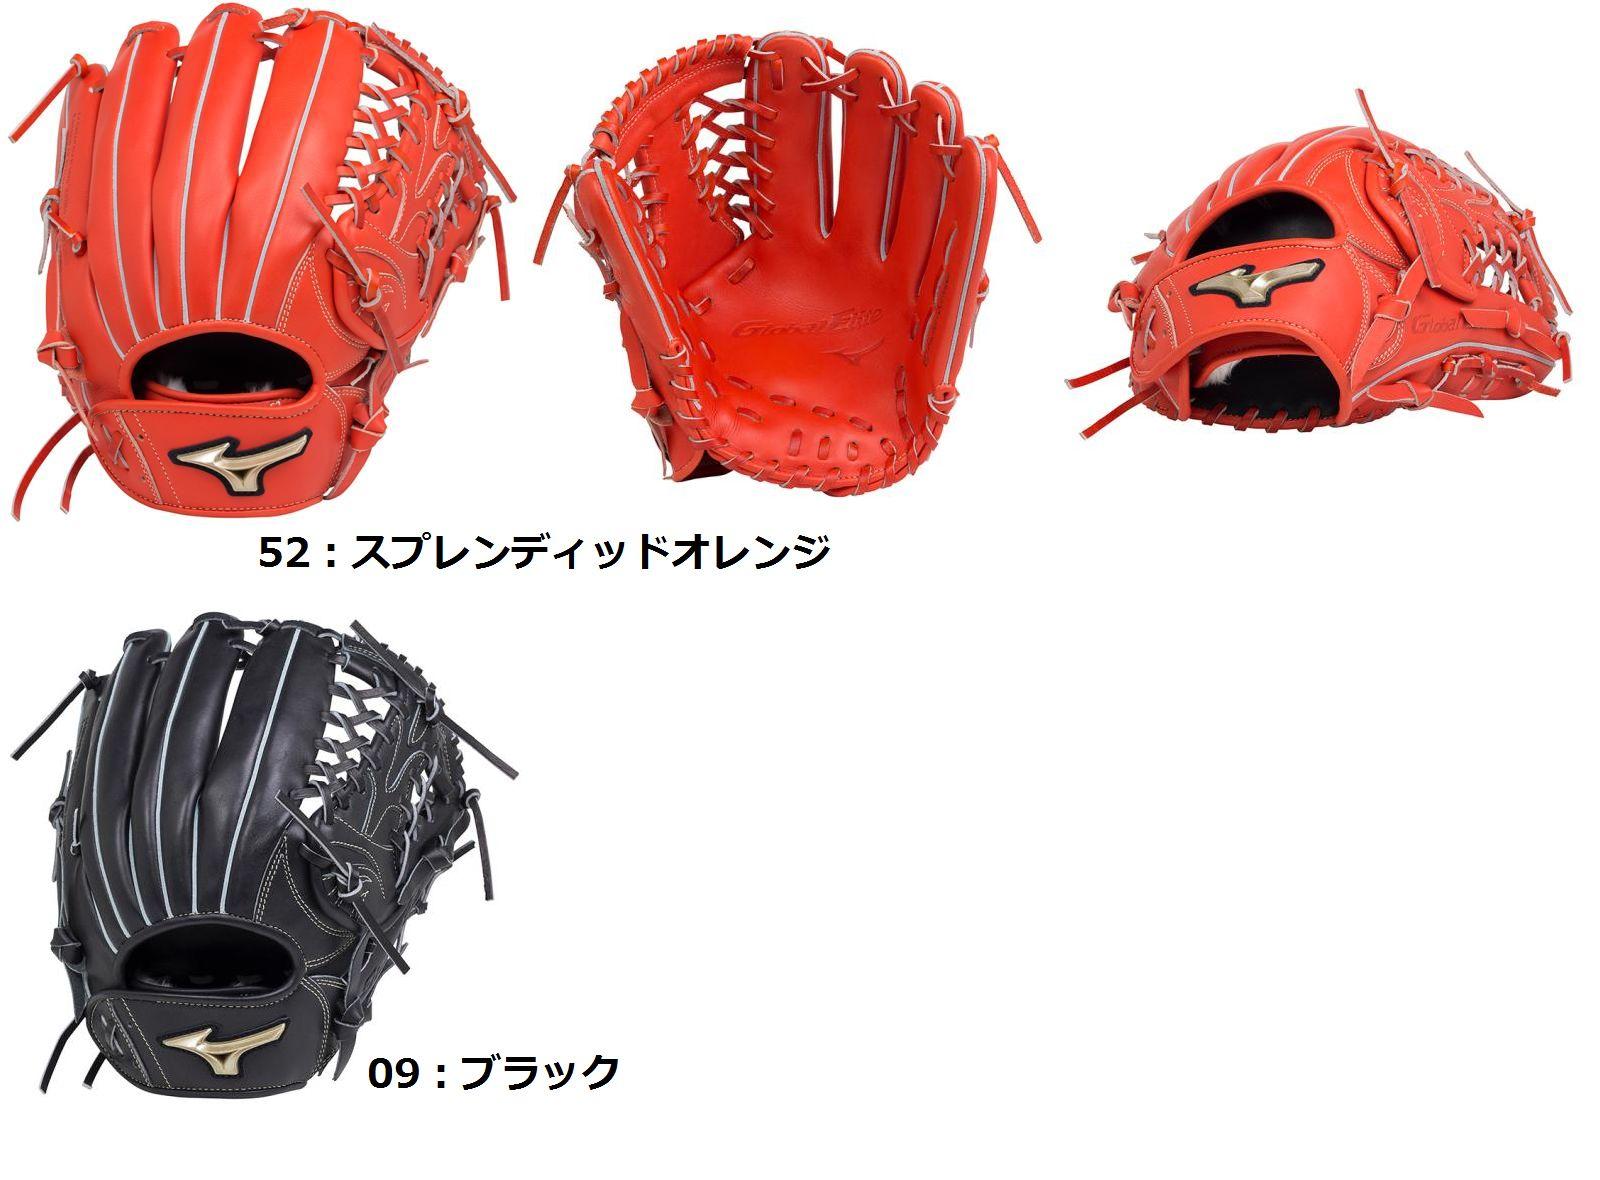 【Mizuno Global Elite~ミズノグローバルエリート】野球一般軟式用グラブ【UMiX】[U2(投手×外野)/サイズ11]【ブラック/スプレンディッドオレンジ】(右投用/左投用)一般軟式 中学軟式 高校軟式